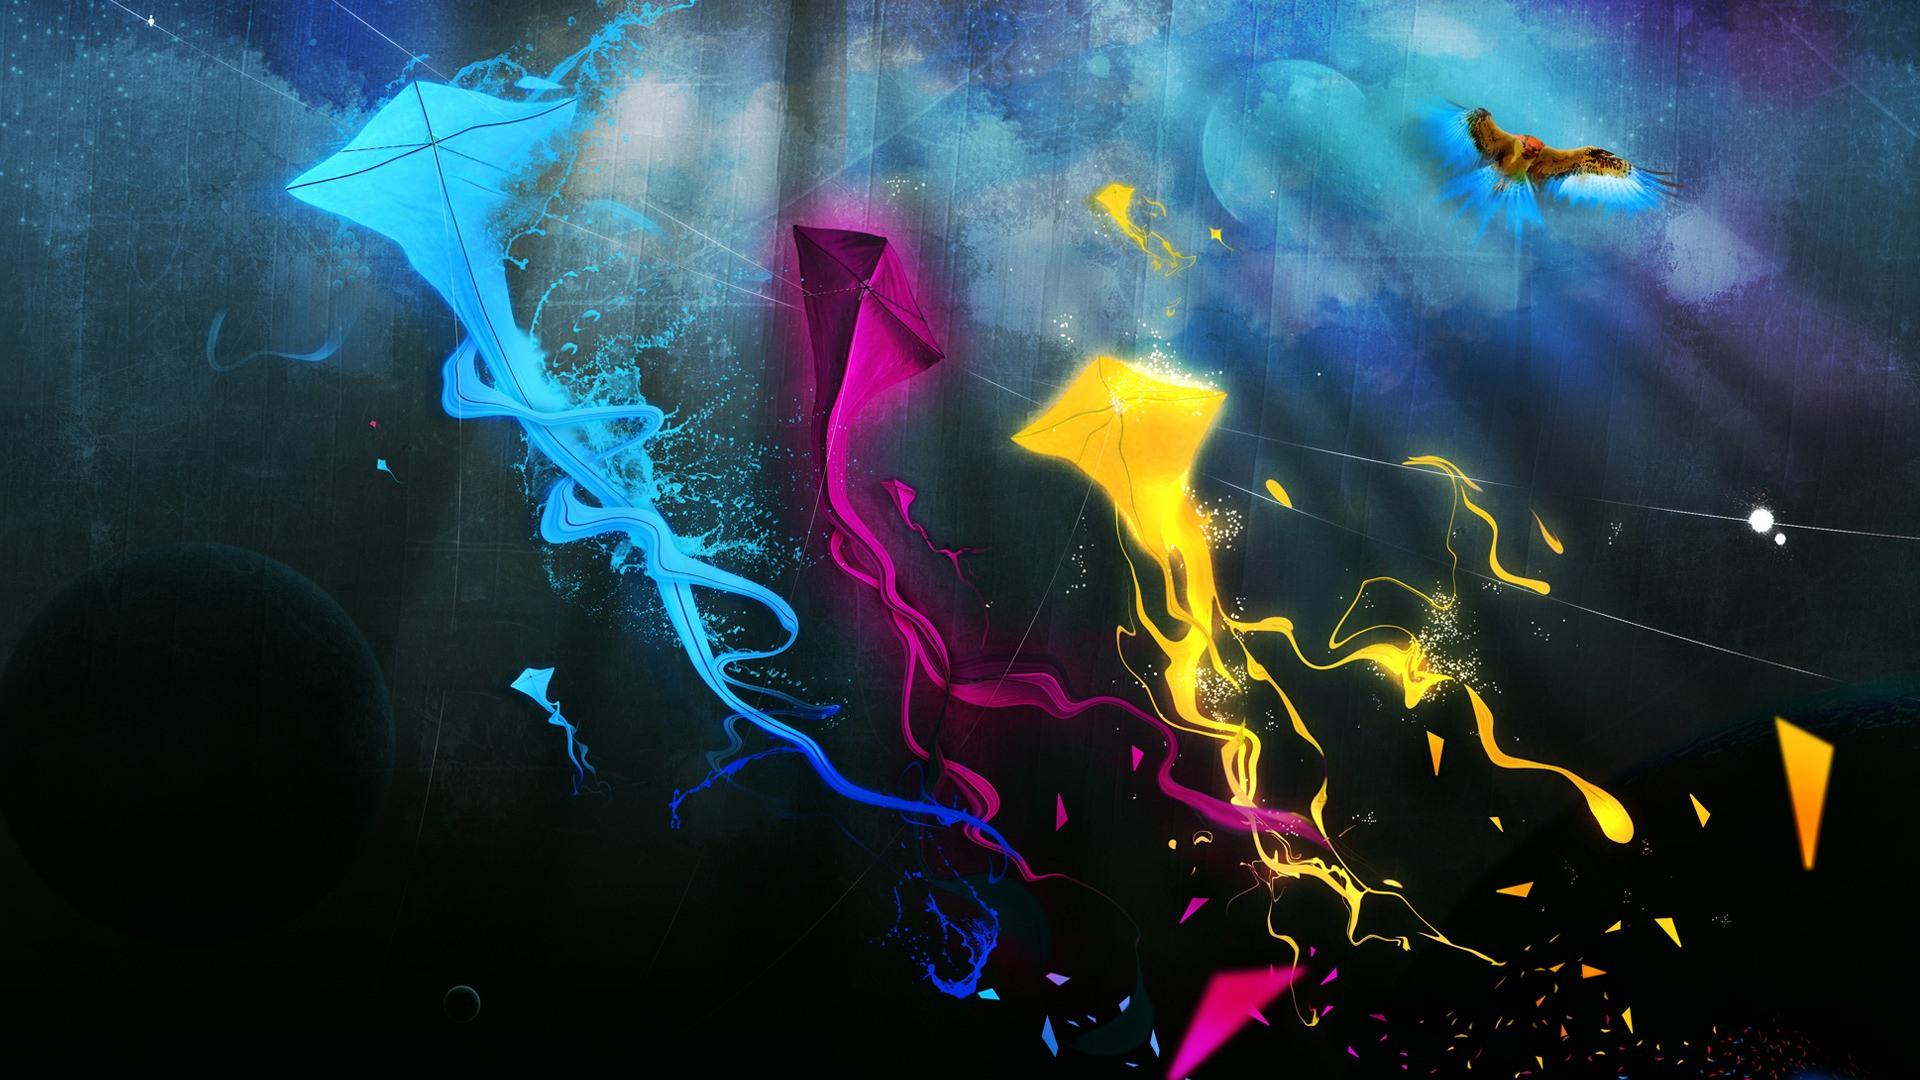 Colorful Kites desktop wallpaper 1920x1080